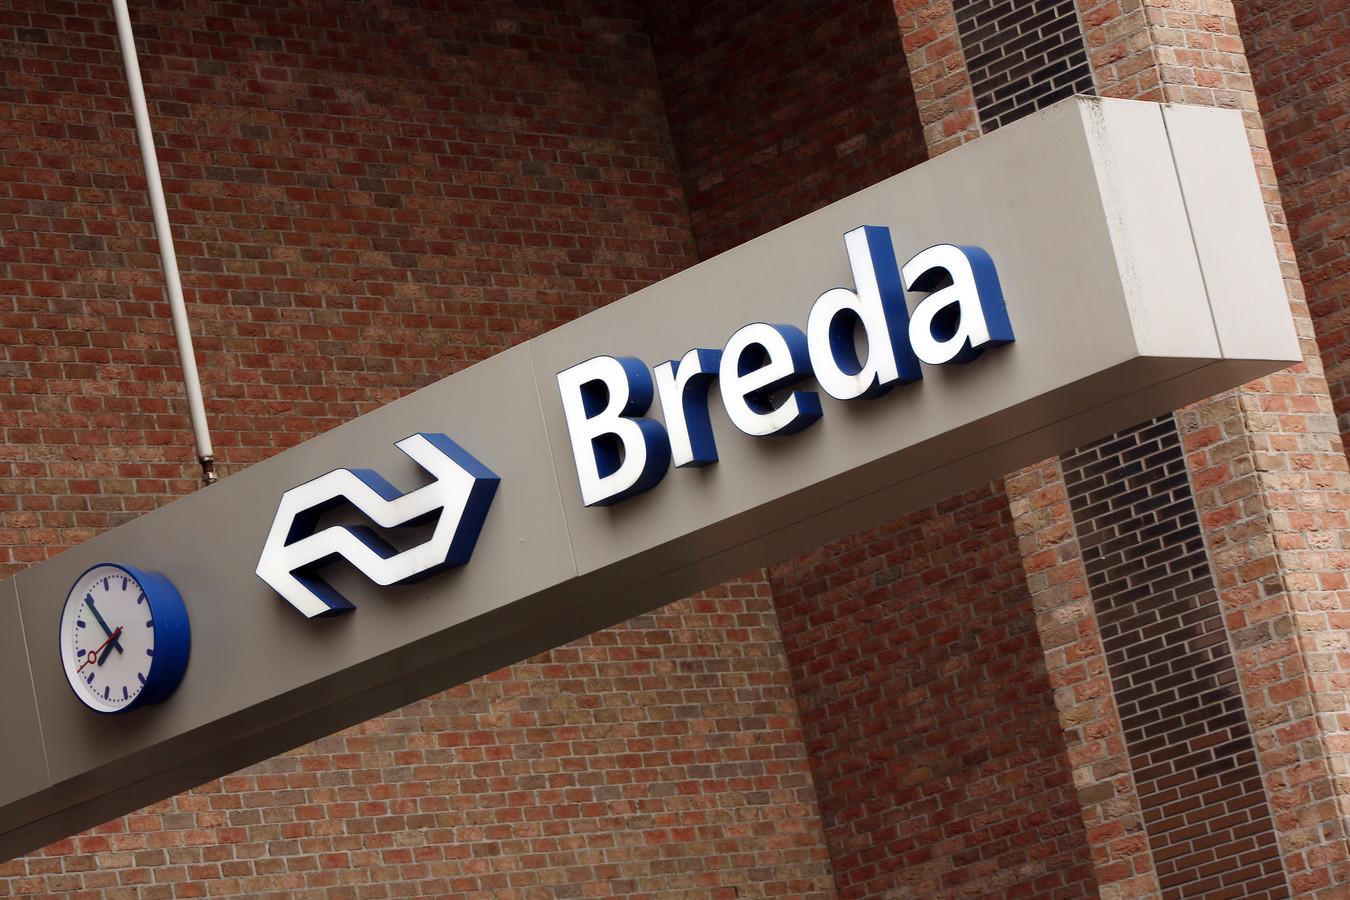 BREDA - Station Breda.